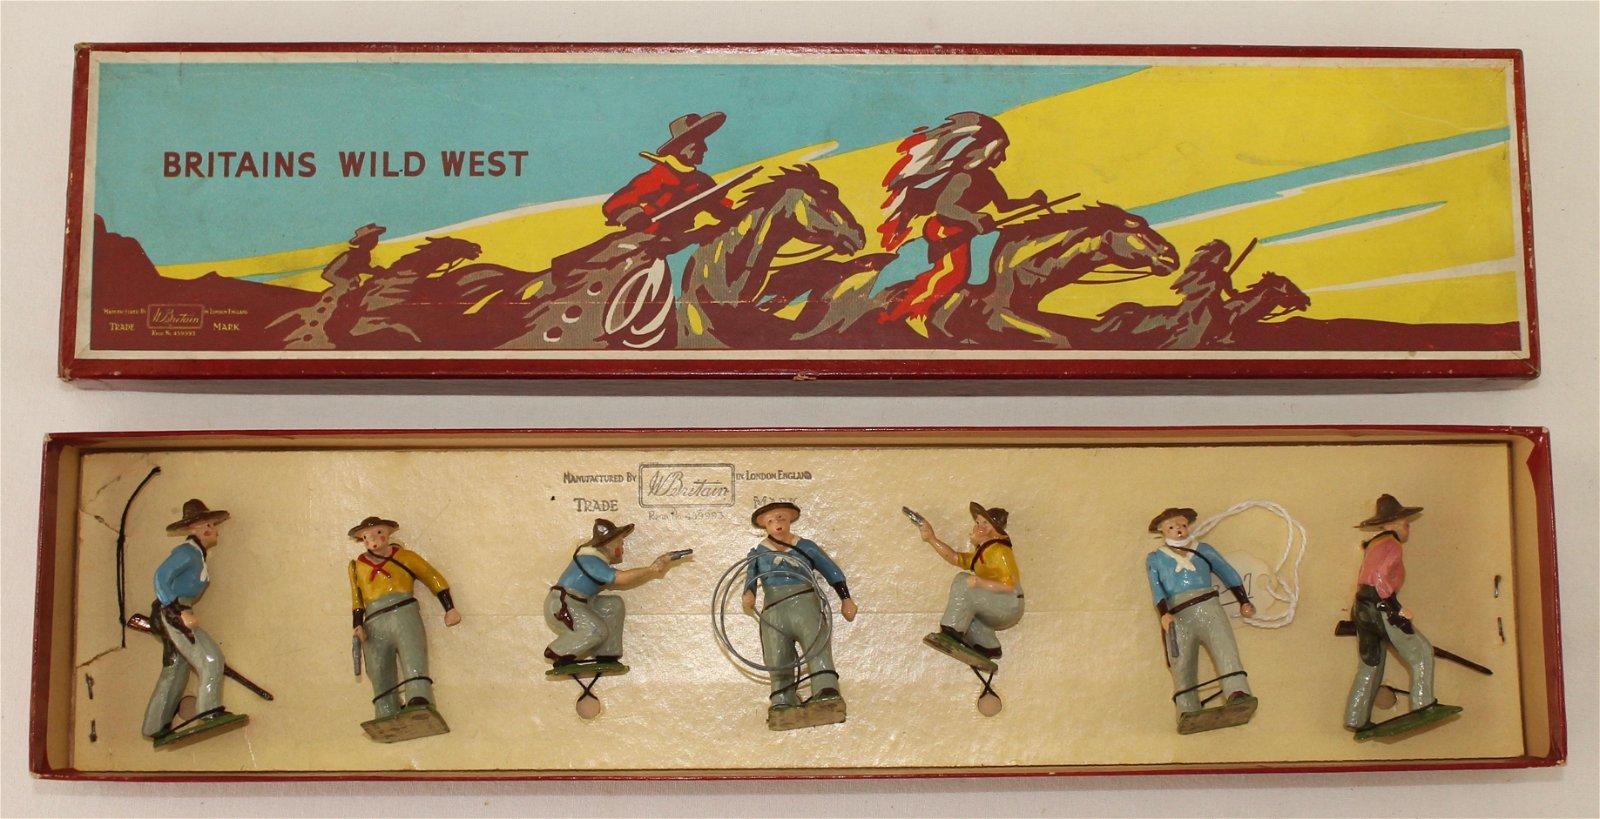 Britains Set #183 Cowboys on Foot